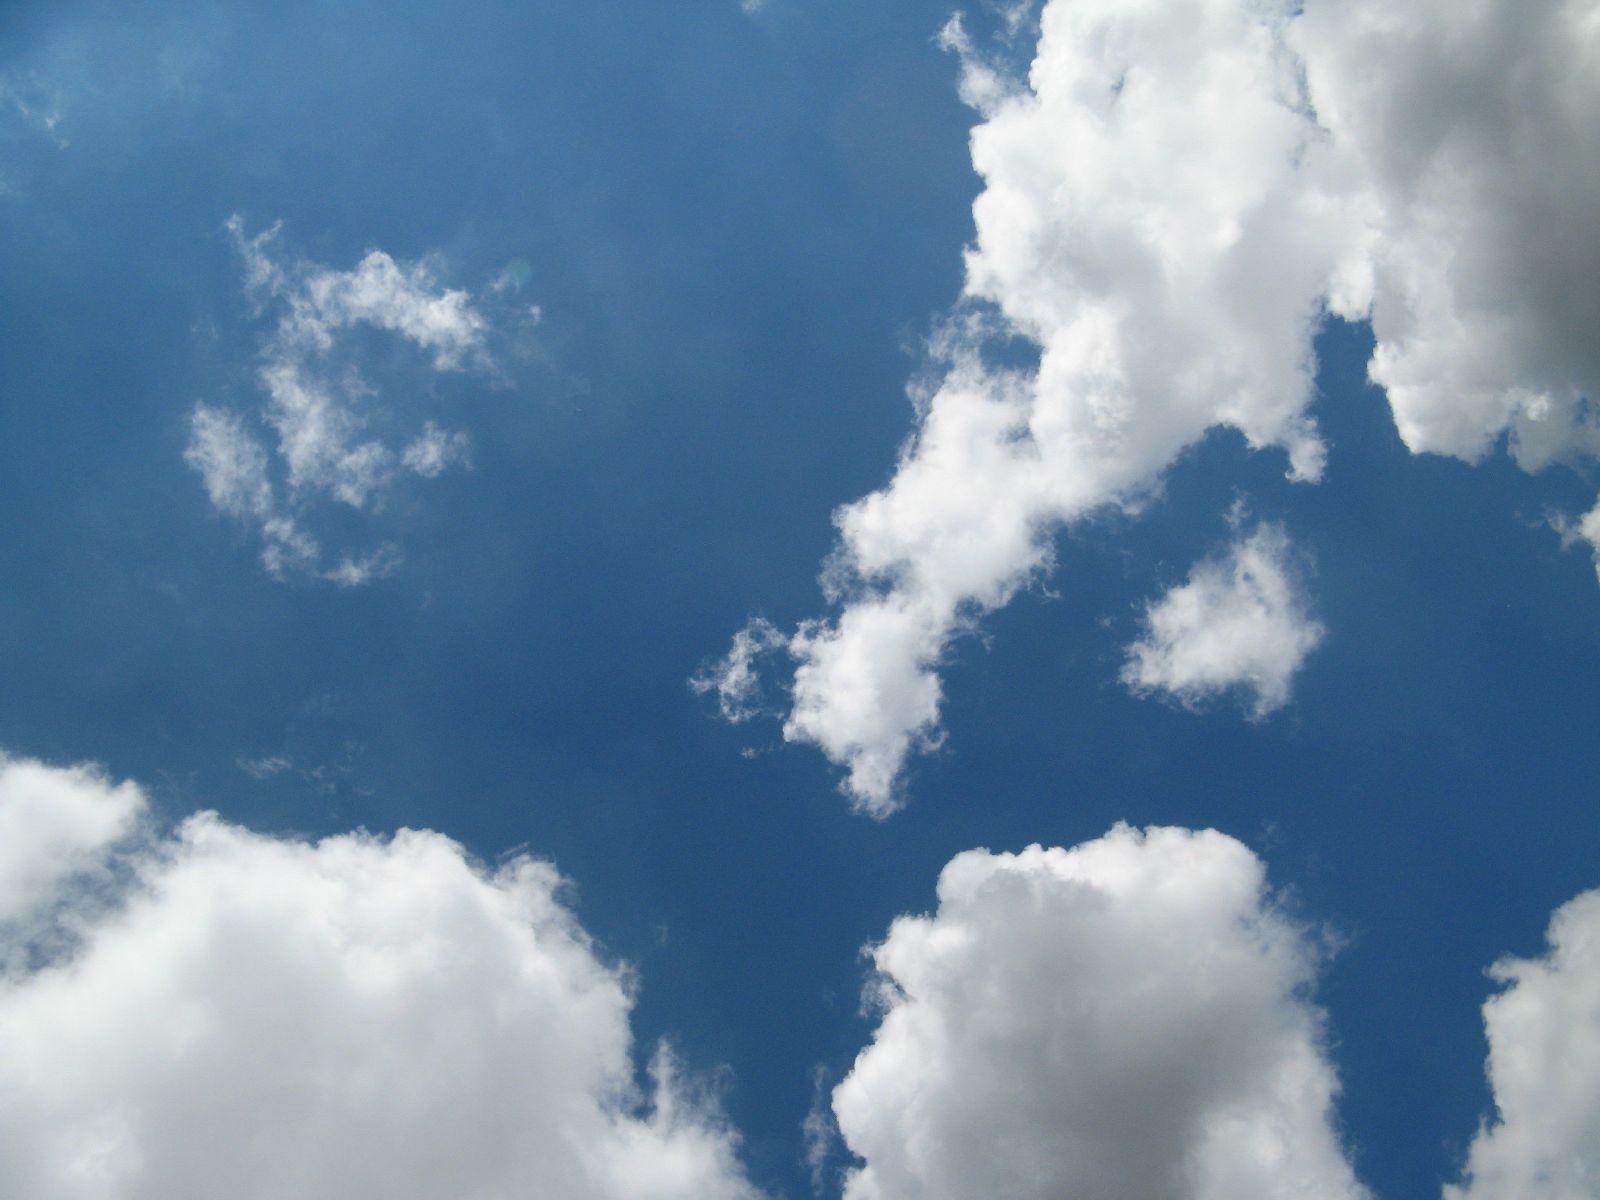 Himmel-Wolken-Foto_Textur_B_01000